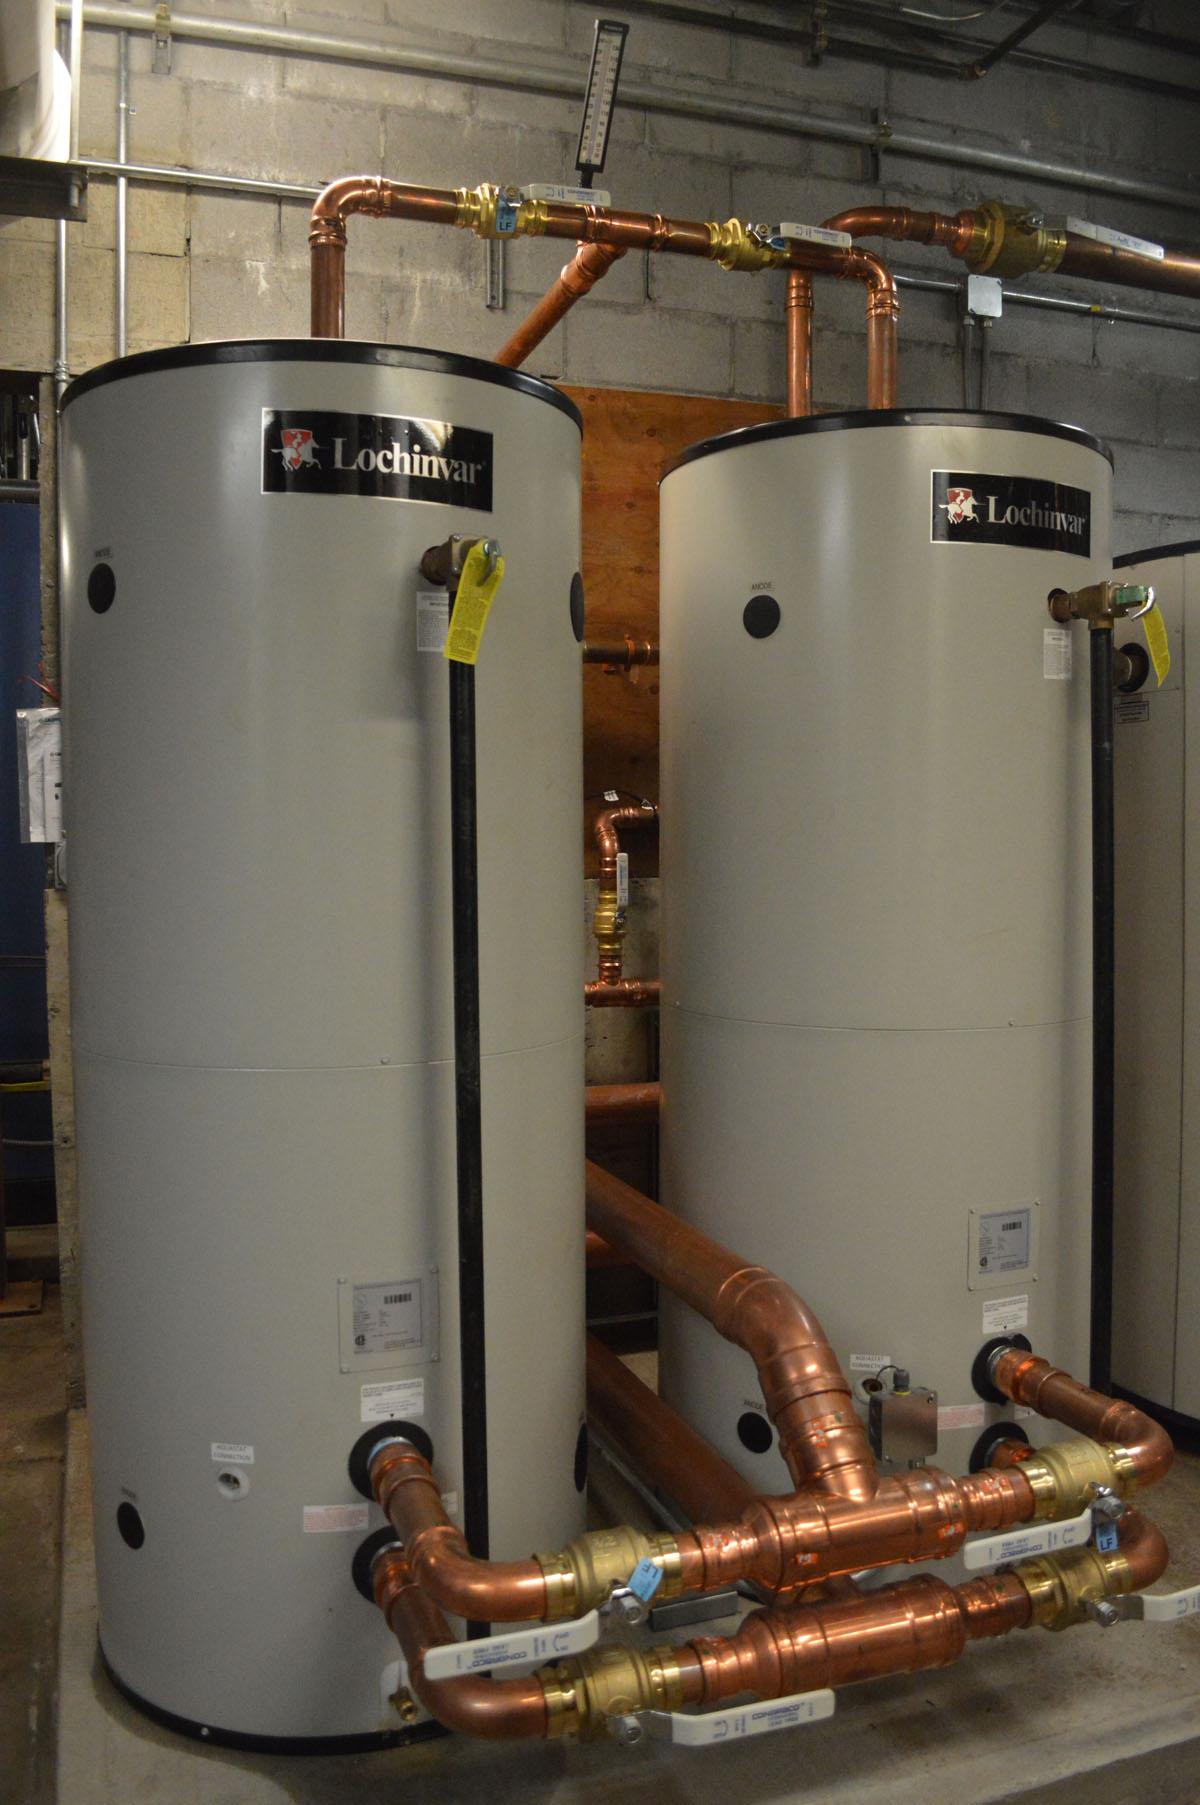 Domestic hot water tanks at Columbia